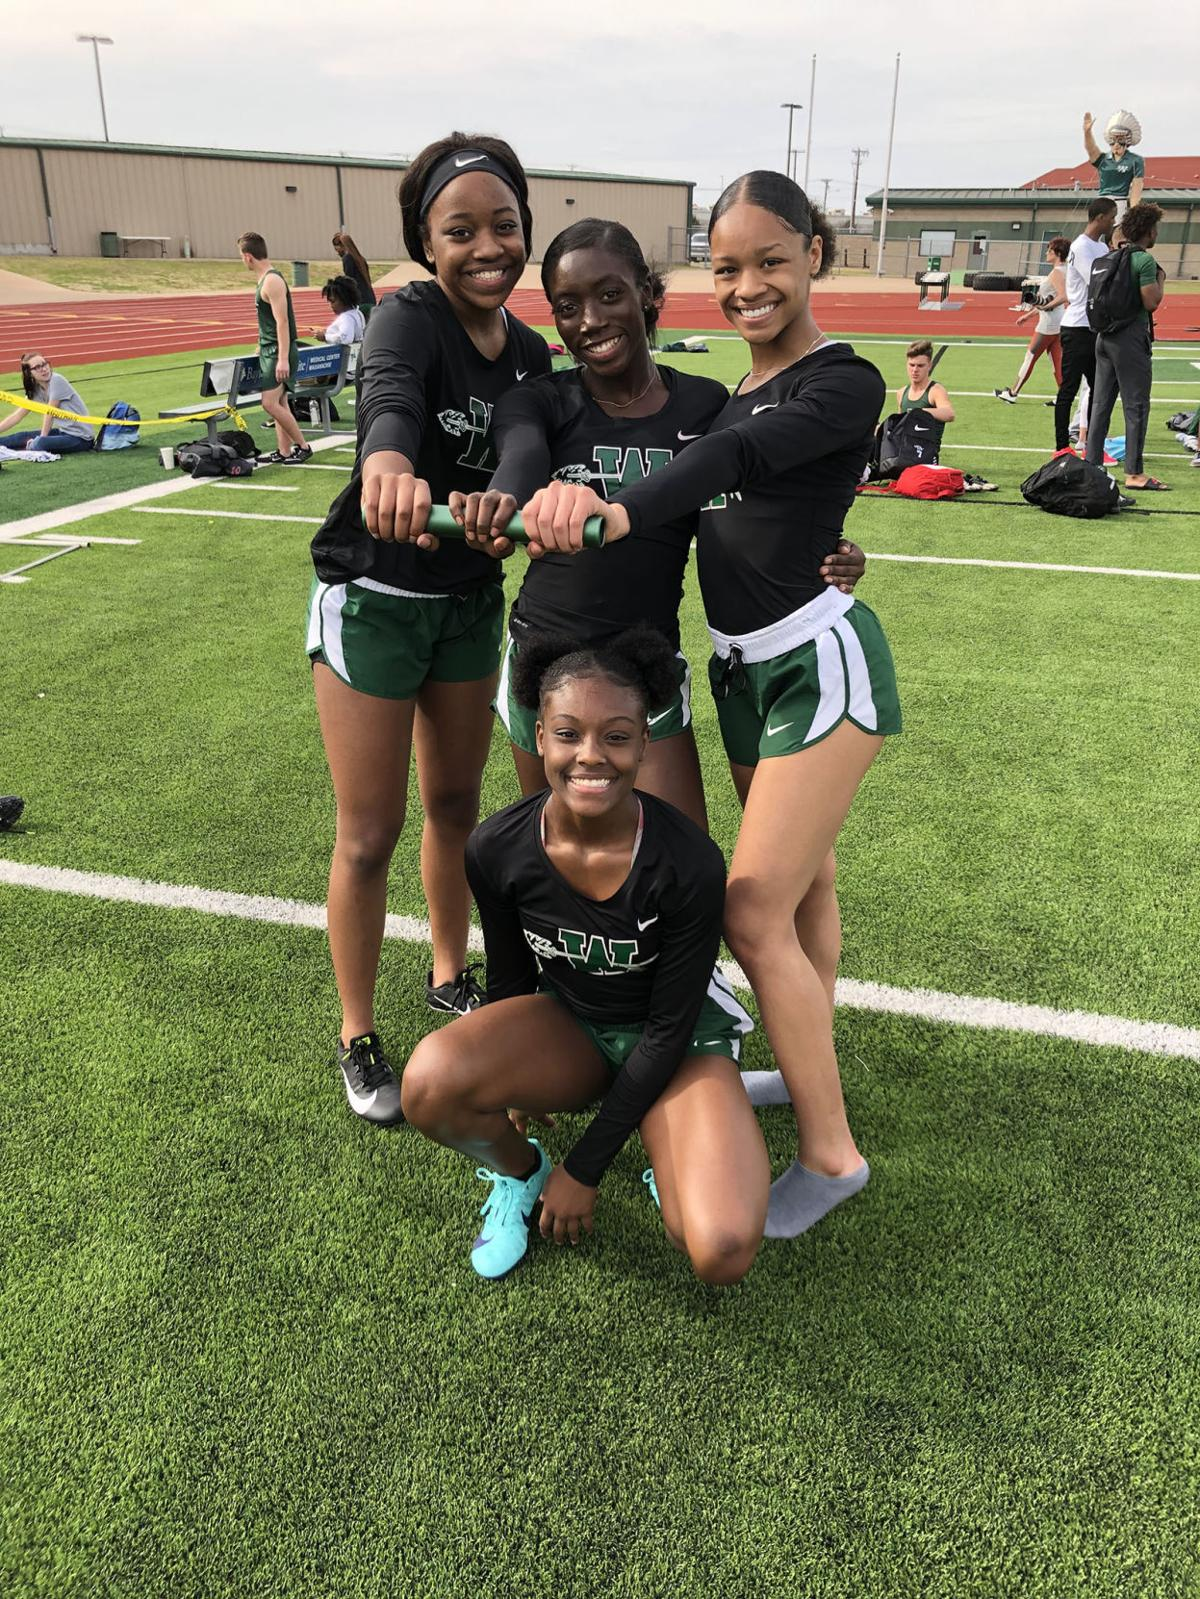 whs girls 4x200m relay team